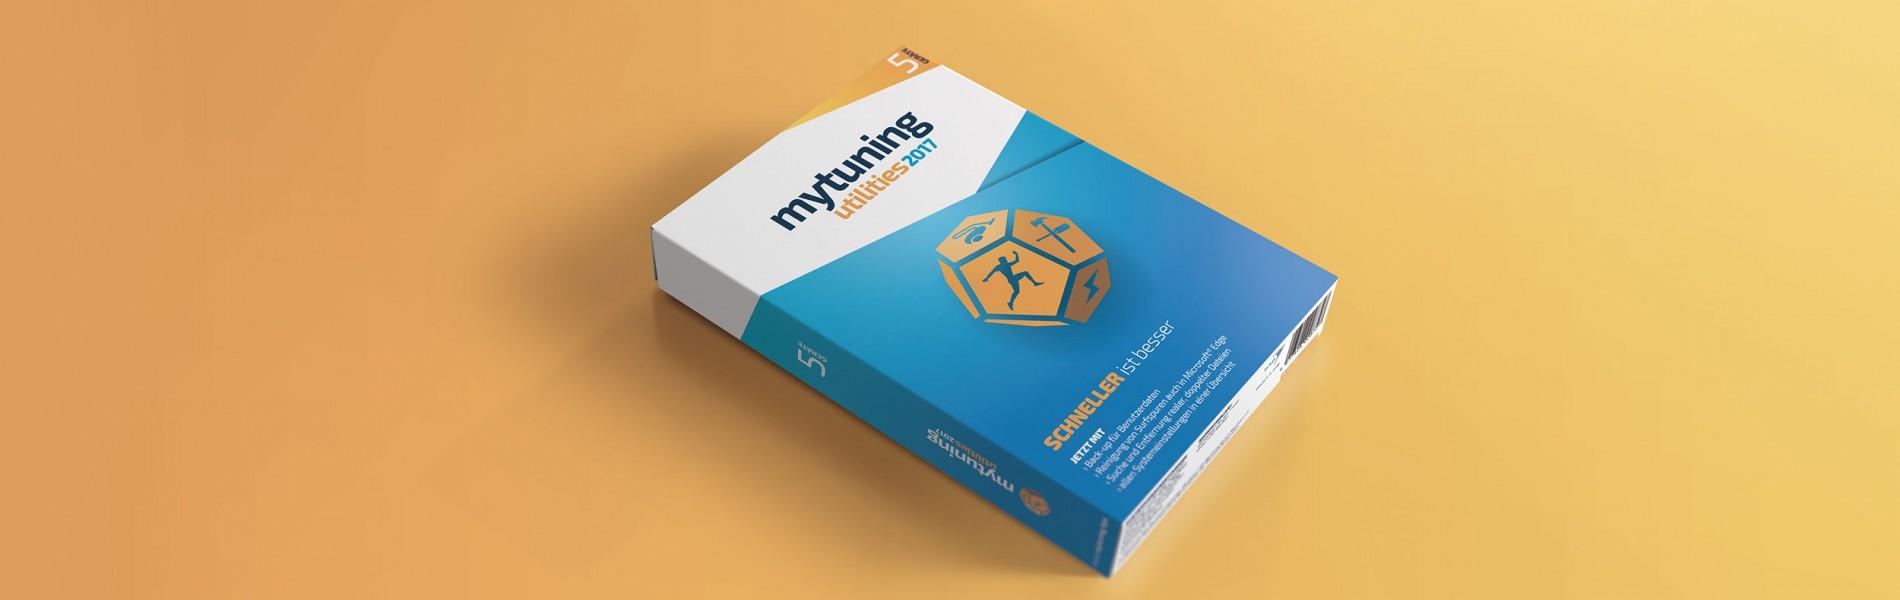 mytuning utilities 2017